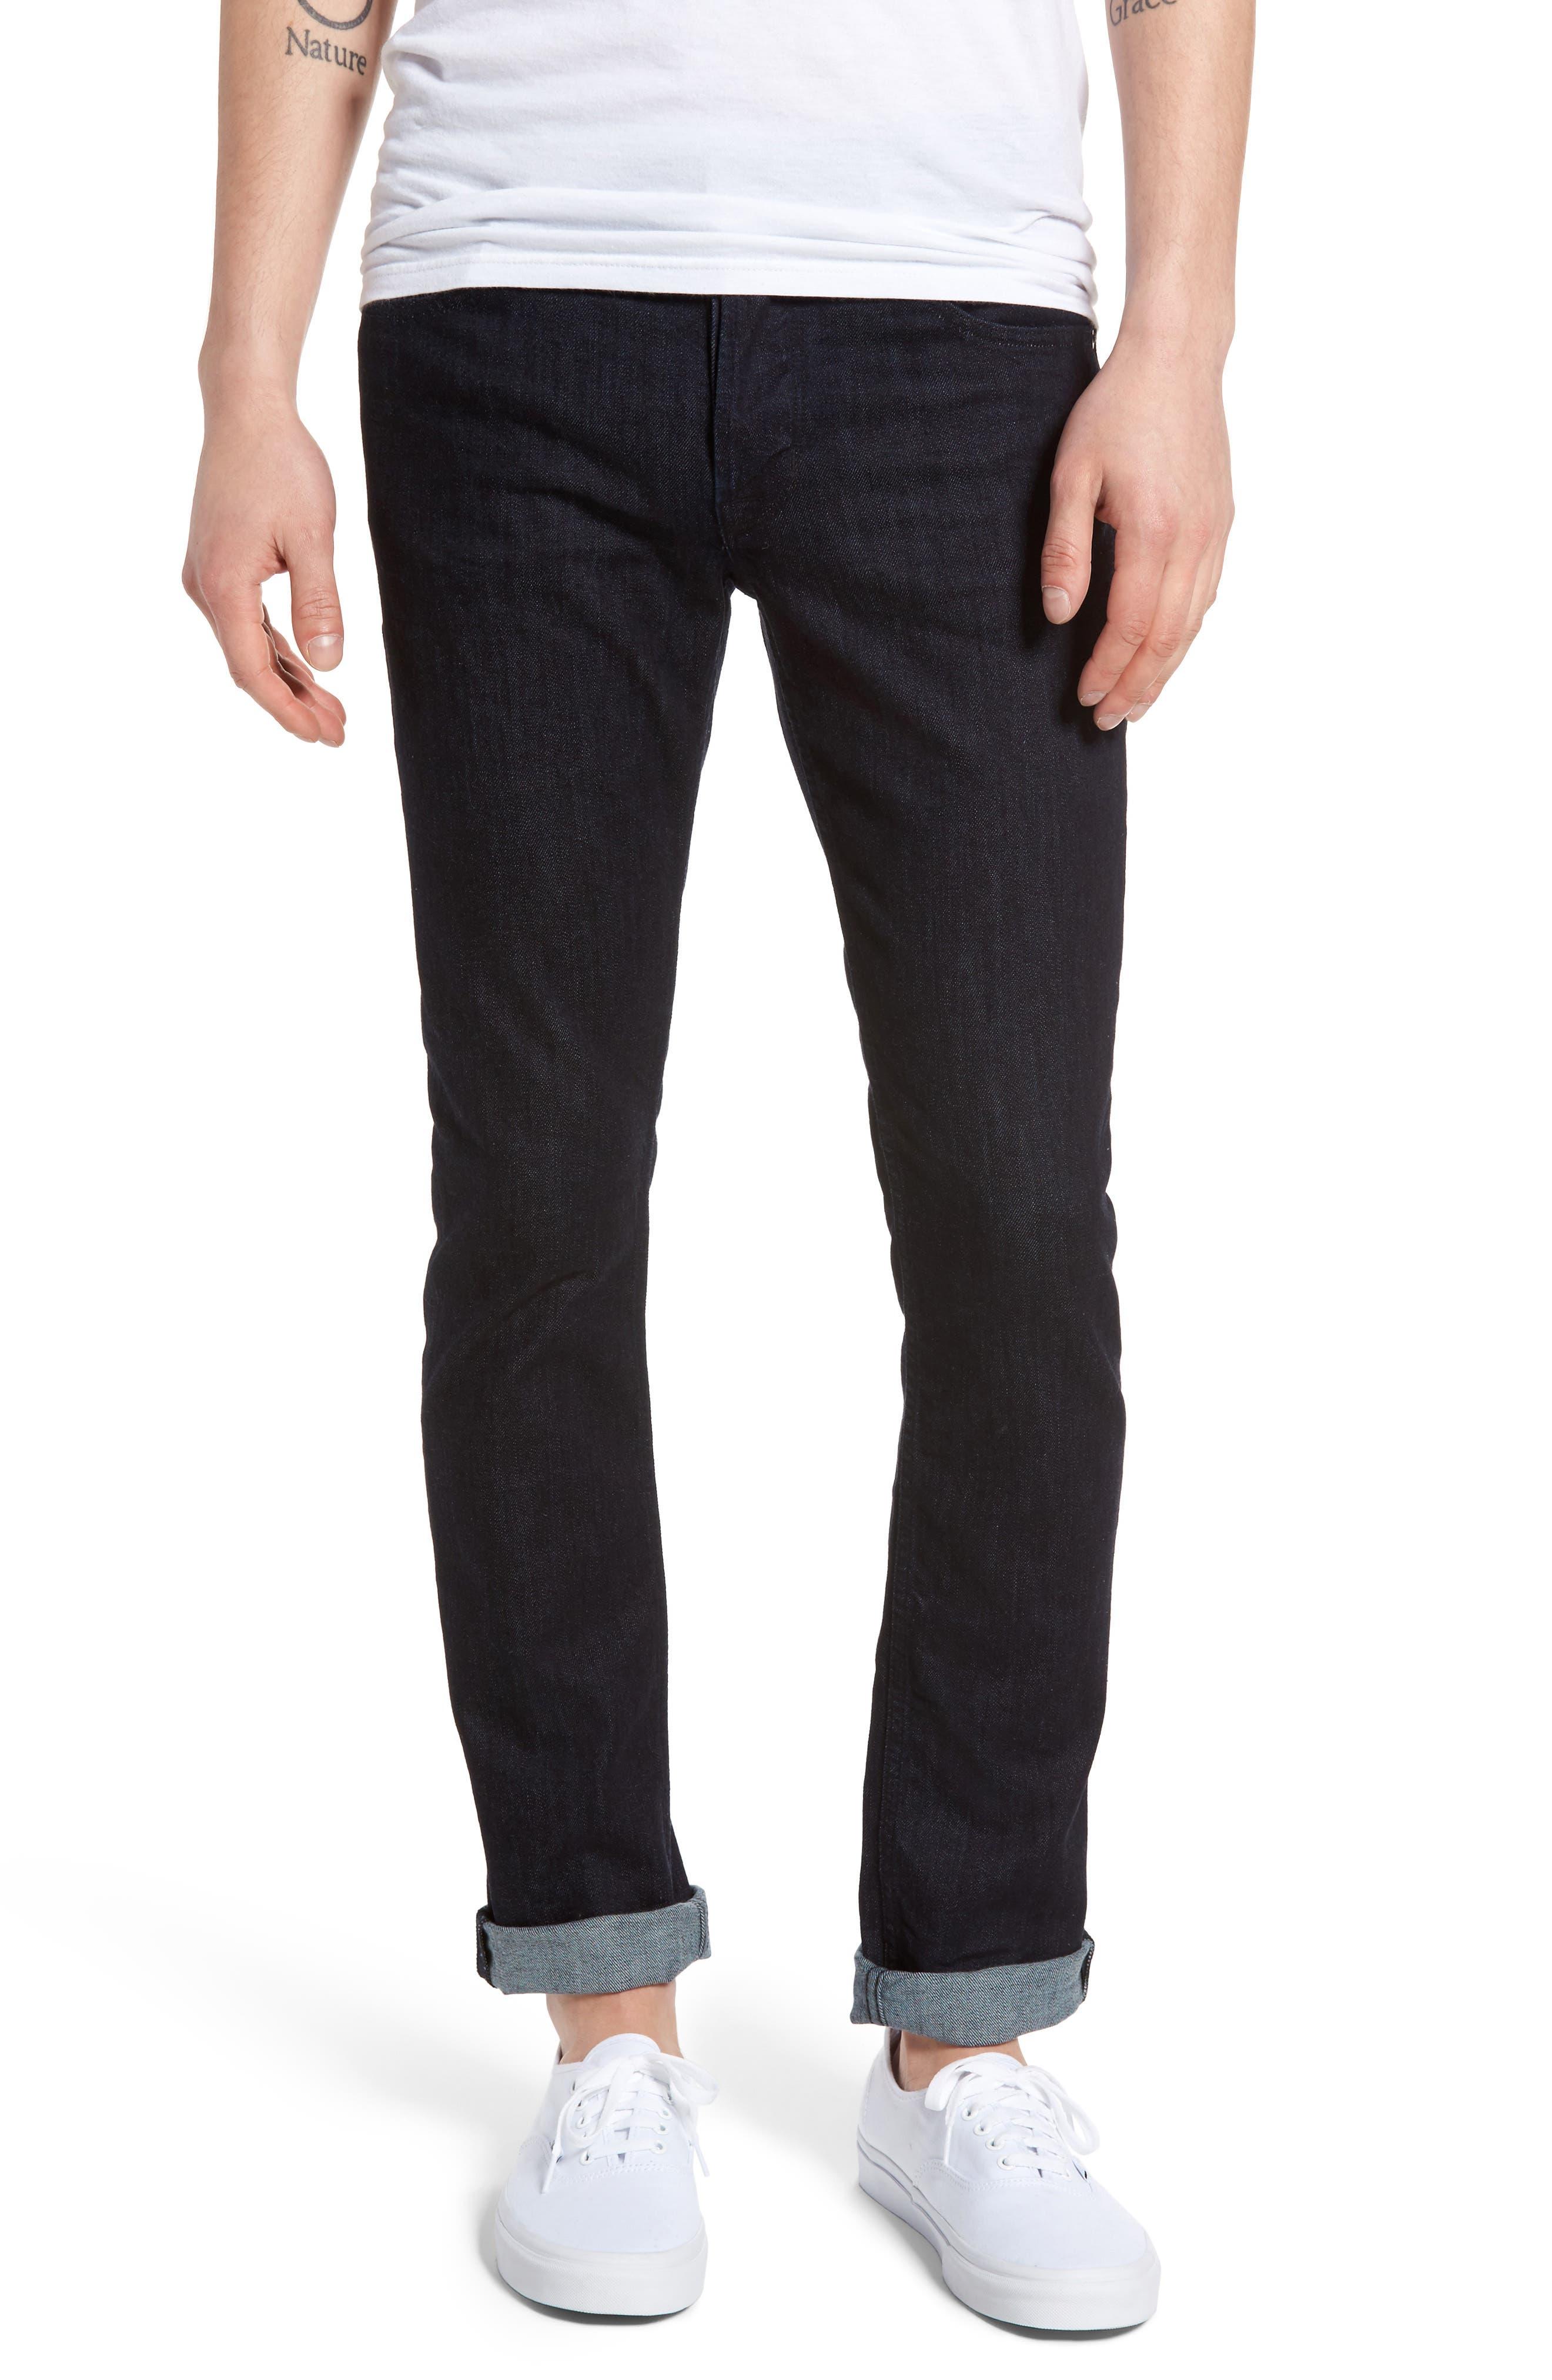 Main Image - Hudson Jeans Axl Skinny Fit Jeans (Firestone)